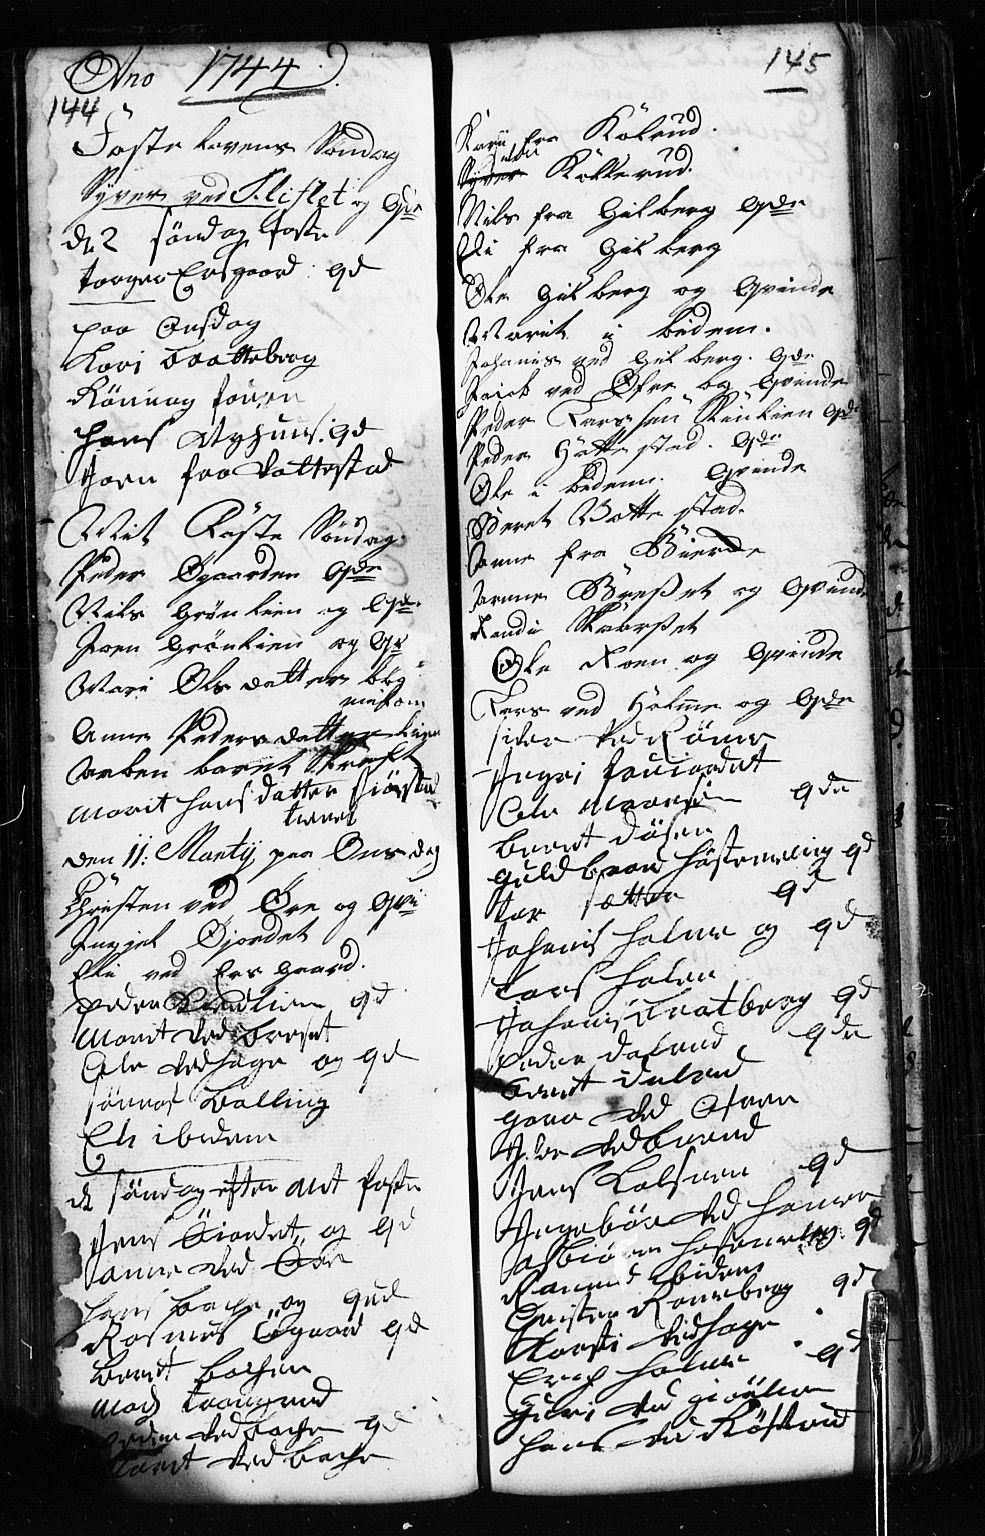 SAH, Fåberg prestekontor, Klokkerbok nr. 2, 1741-1756, s. 144-145